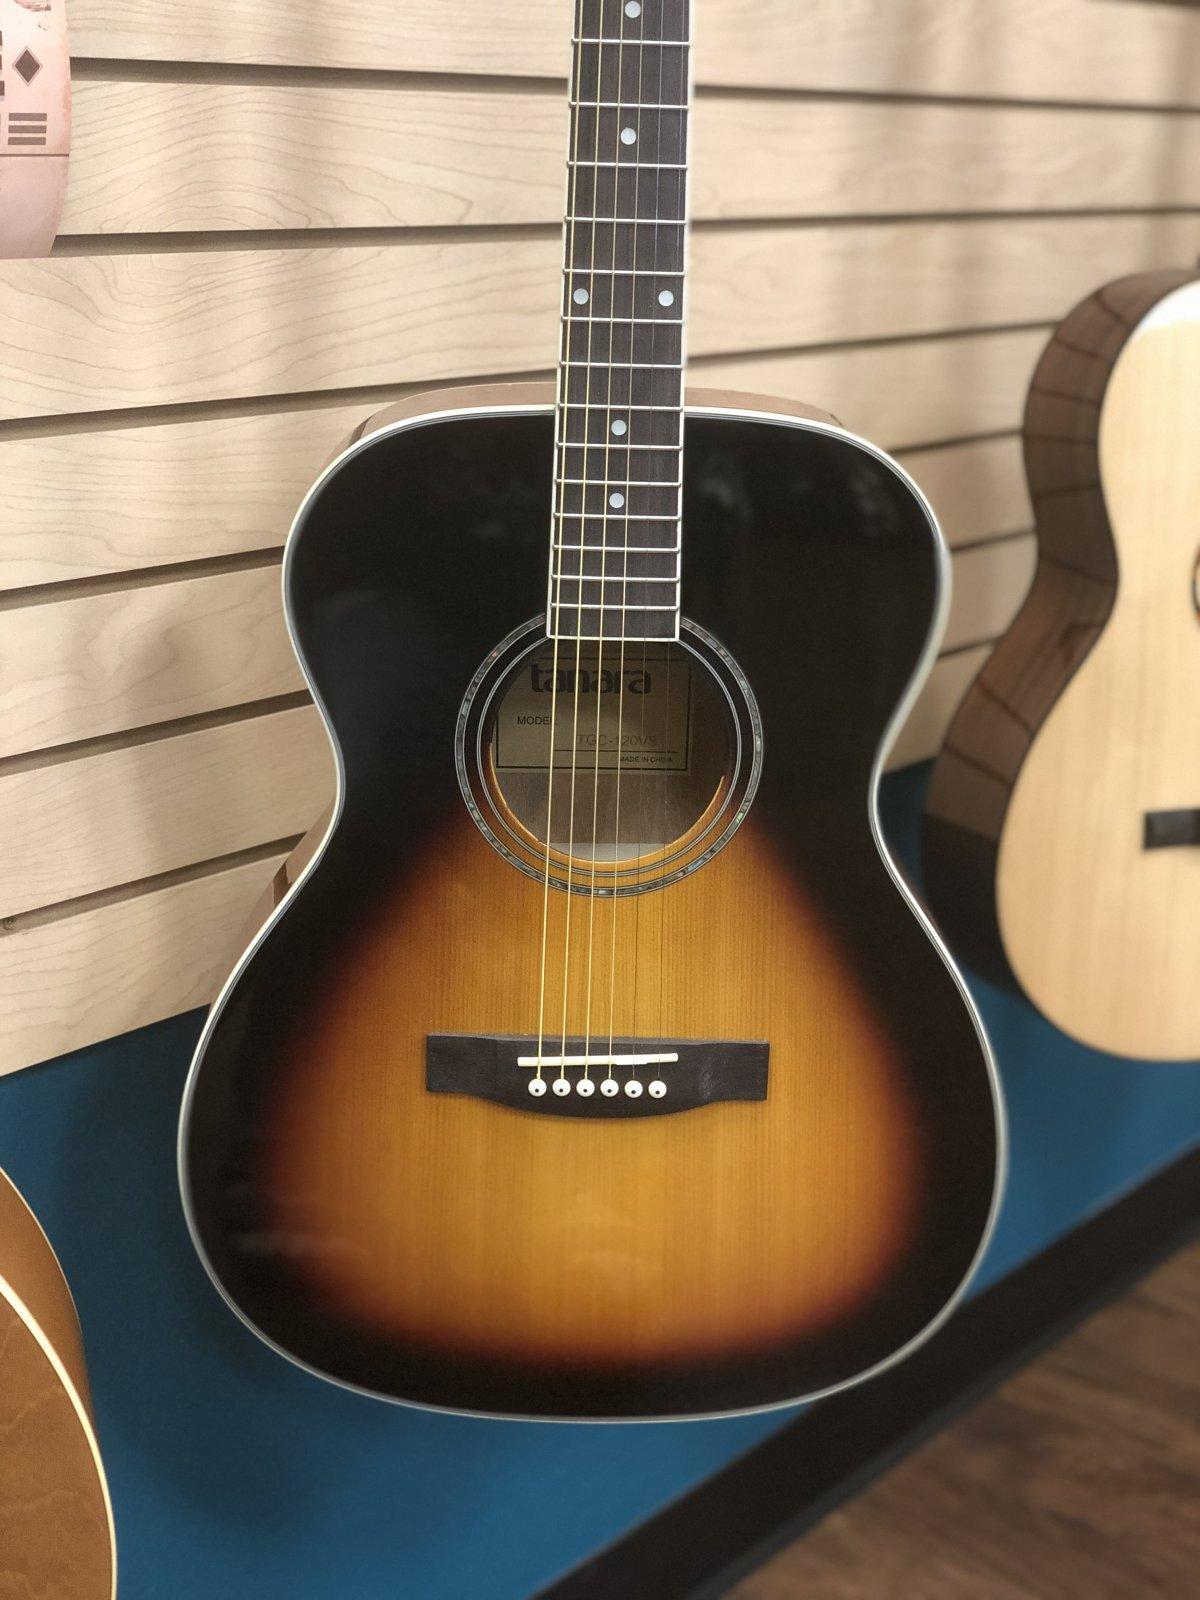 TanaraTGC120VS Grand Concert Acoustic Guitar - Vintage Sunburst